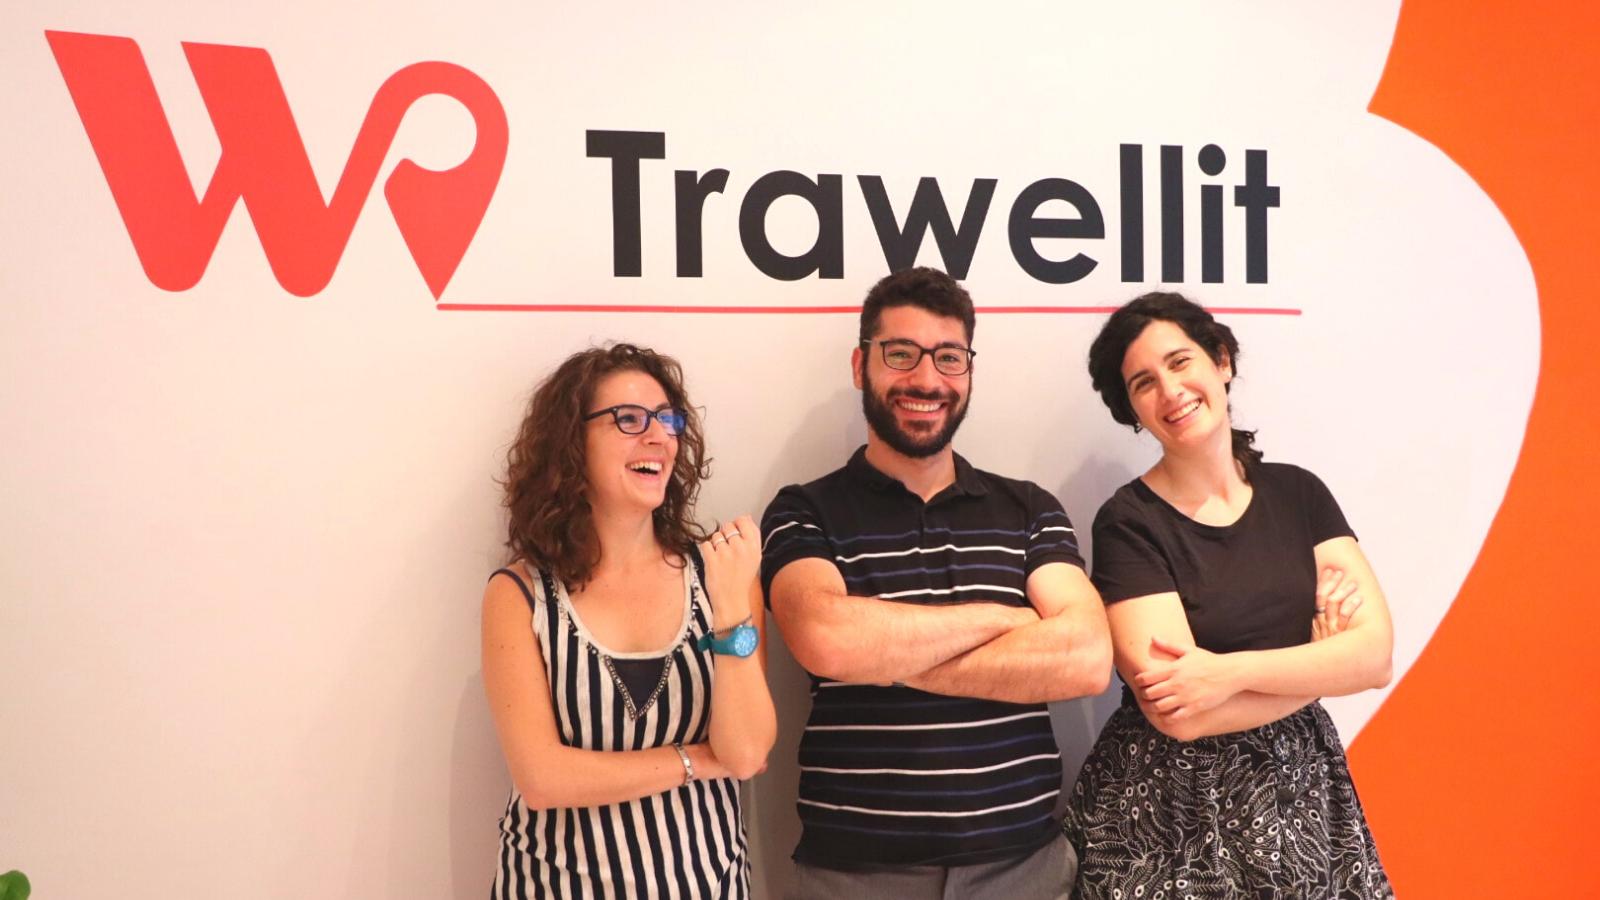 Team Trawellit